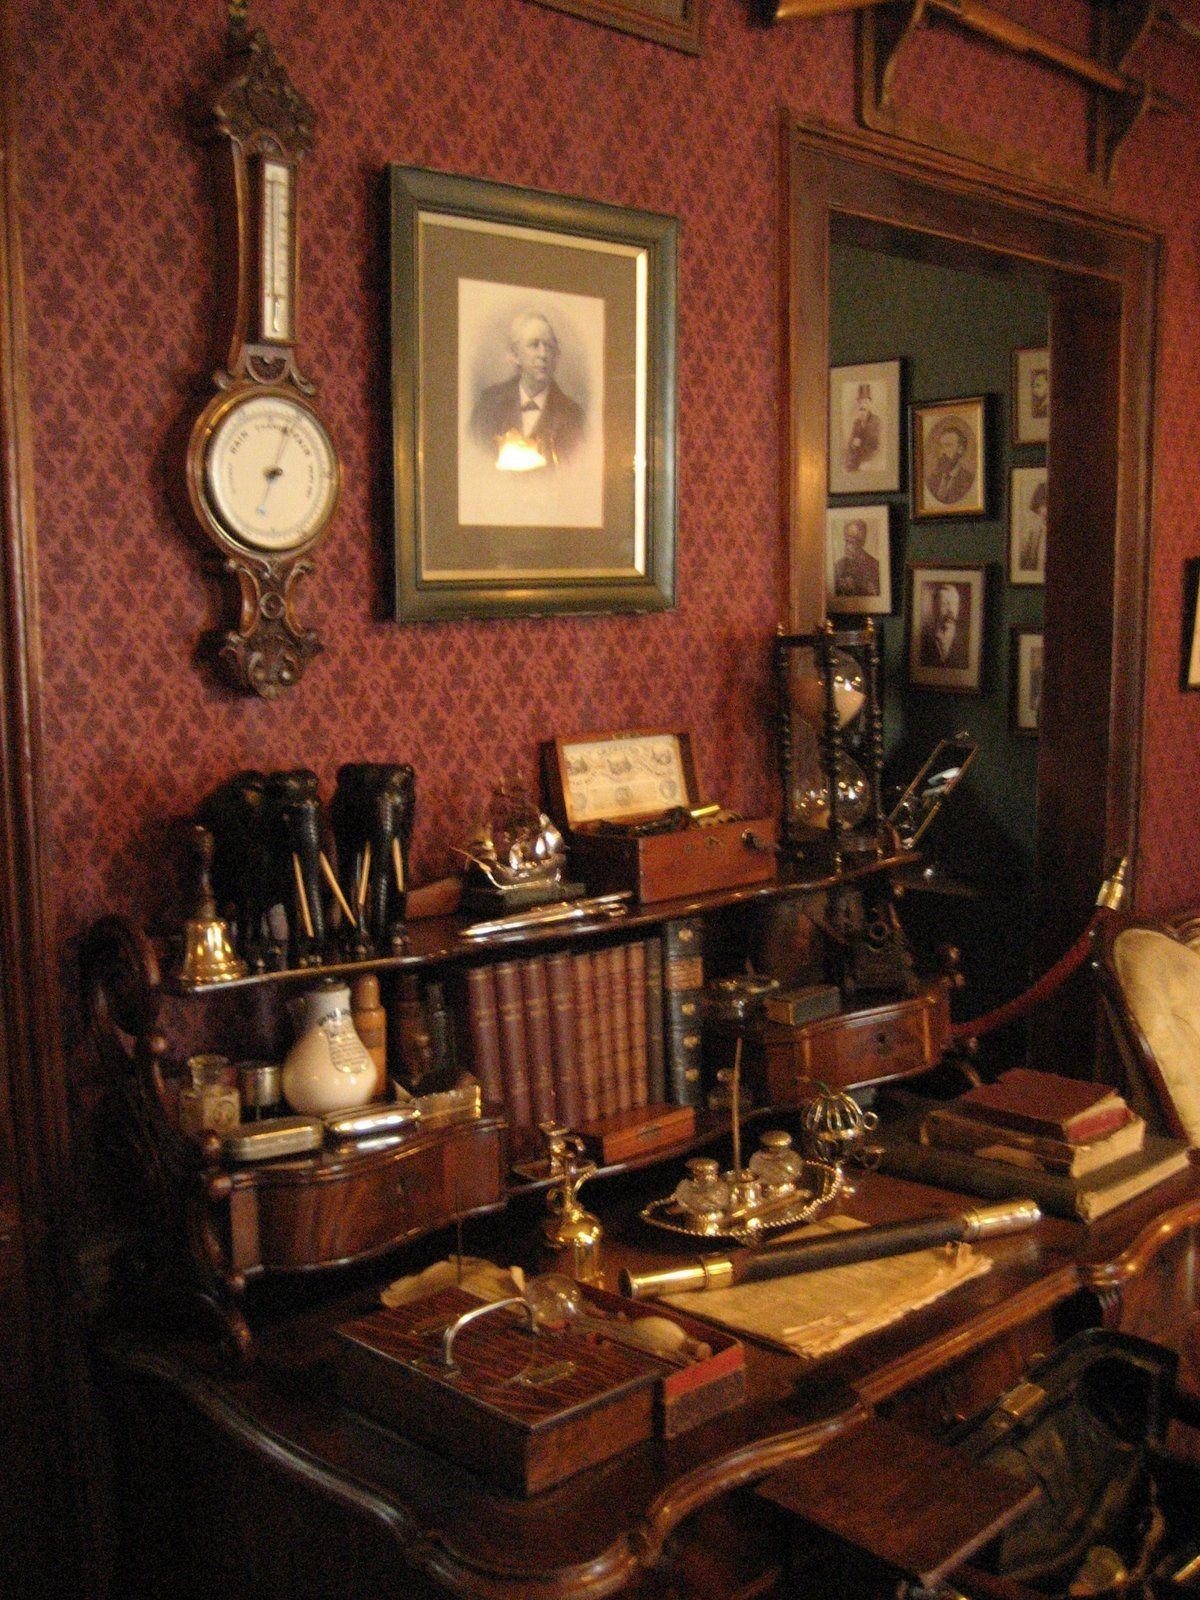 My footprints on the Paths: Sherlock Holmes (名侦探 - 福尔摩斯) - Part 2